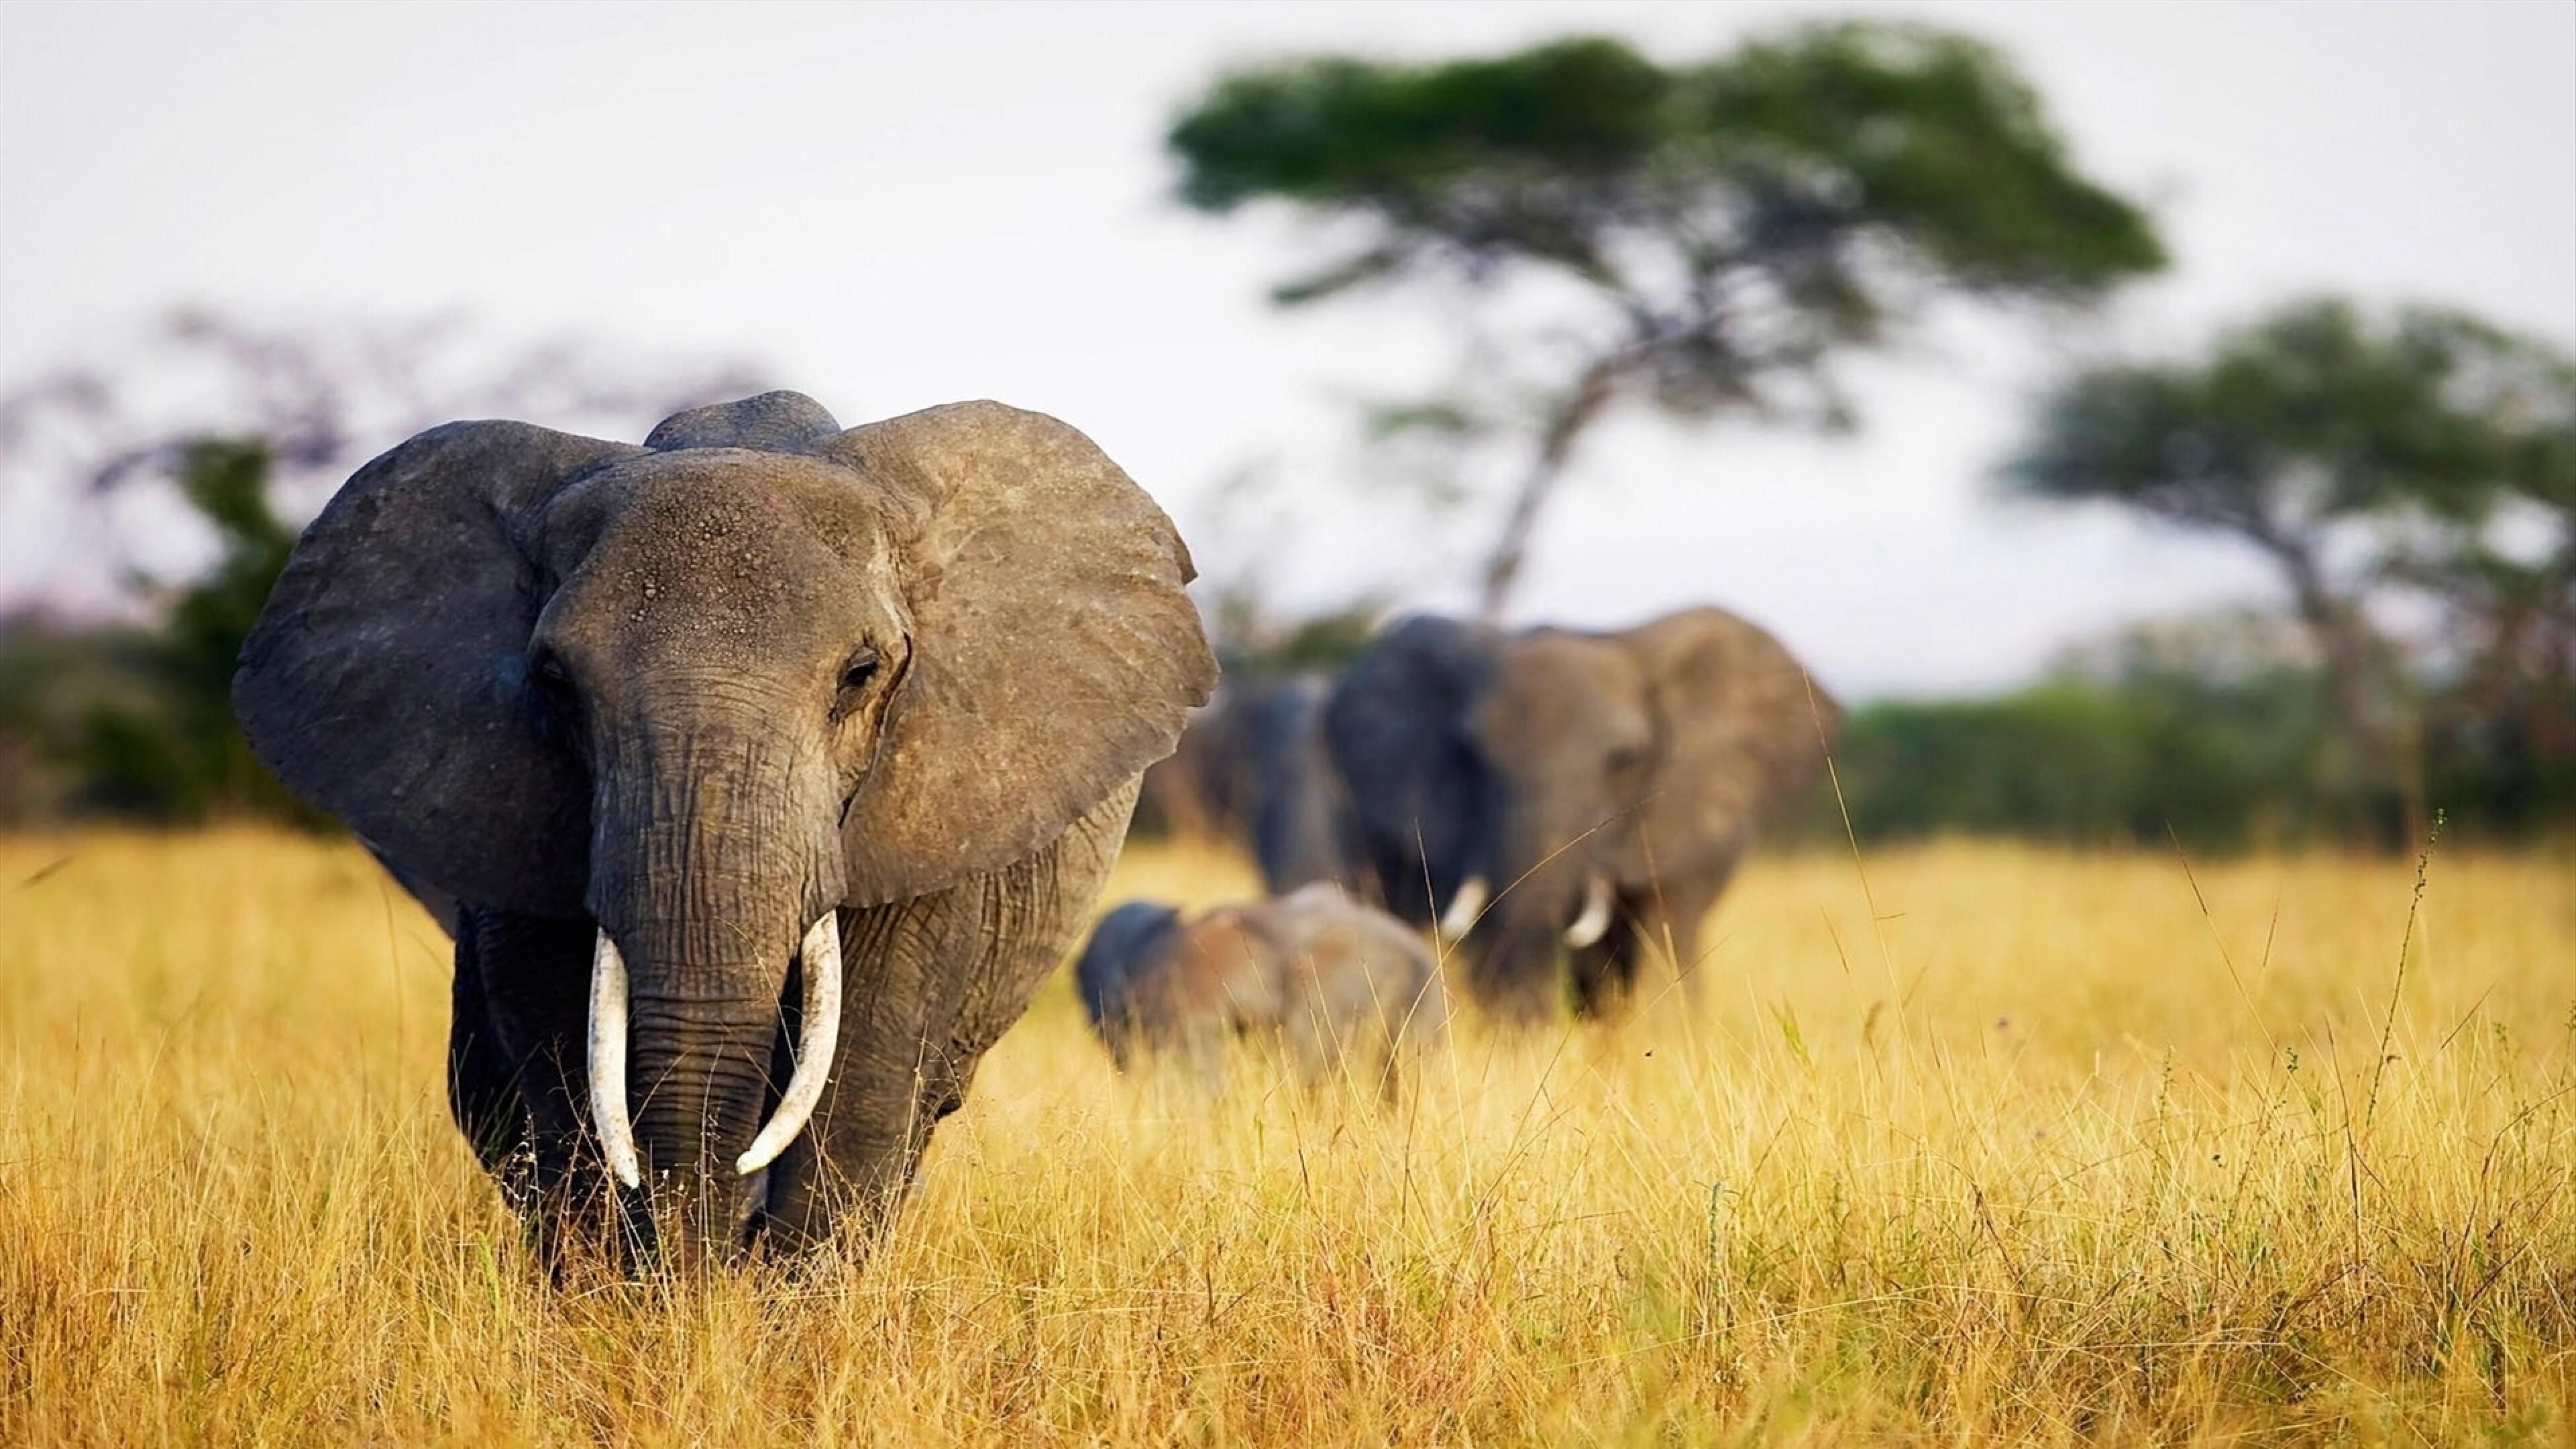 Wildlife Elephant 4K Pic Download